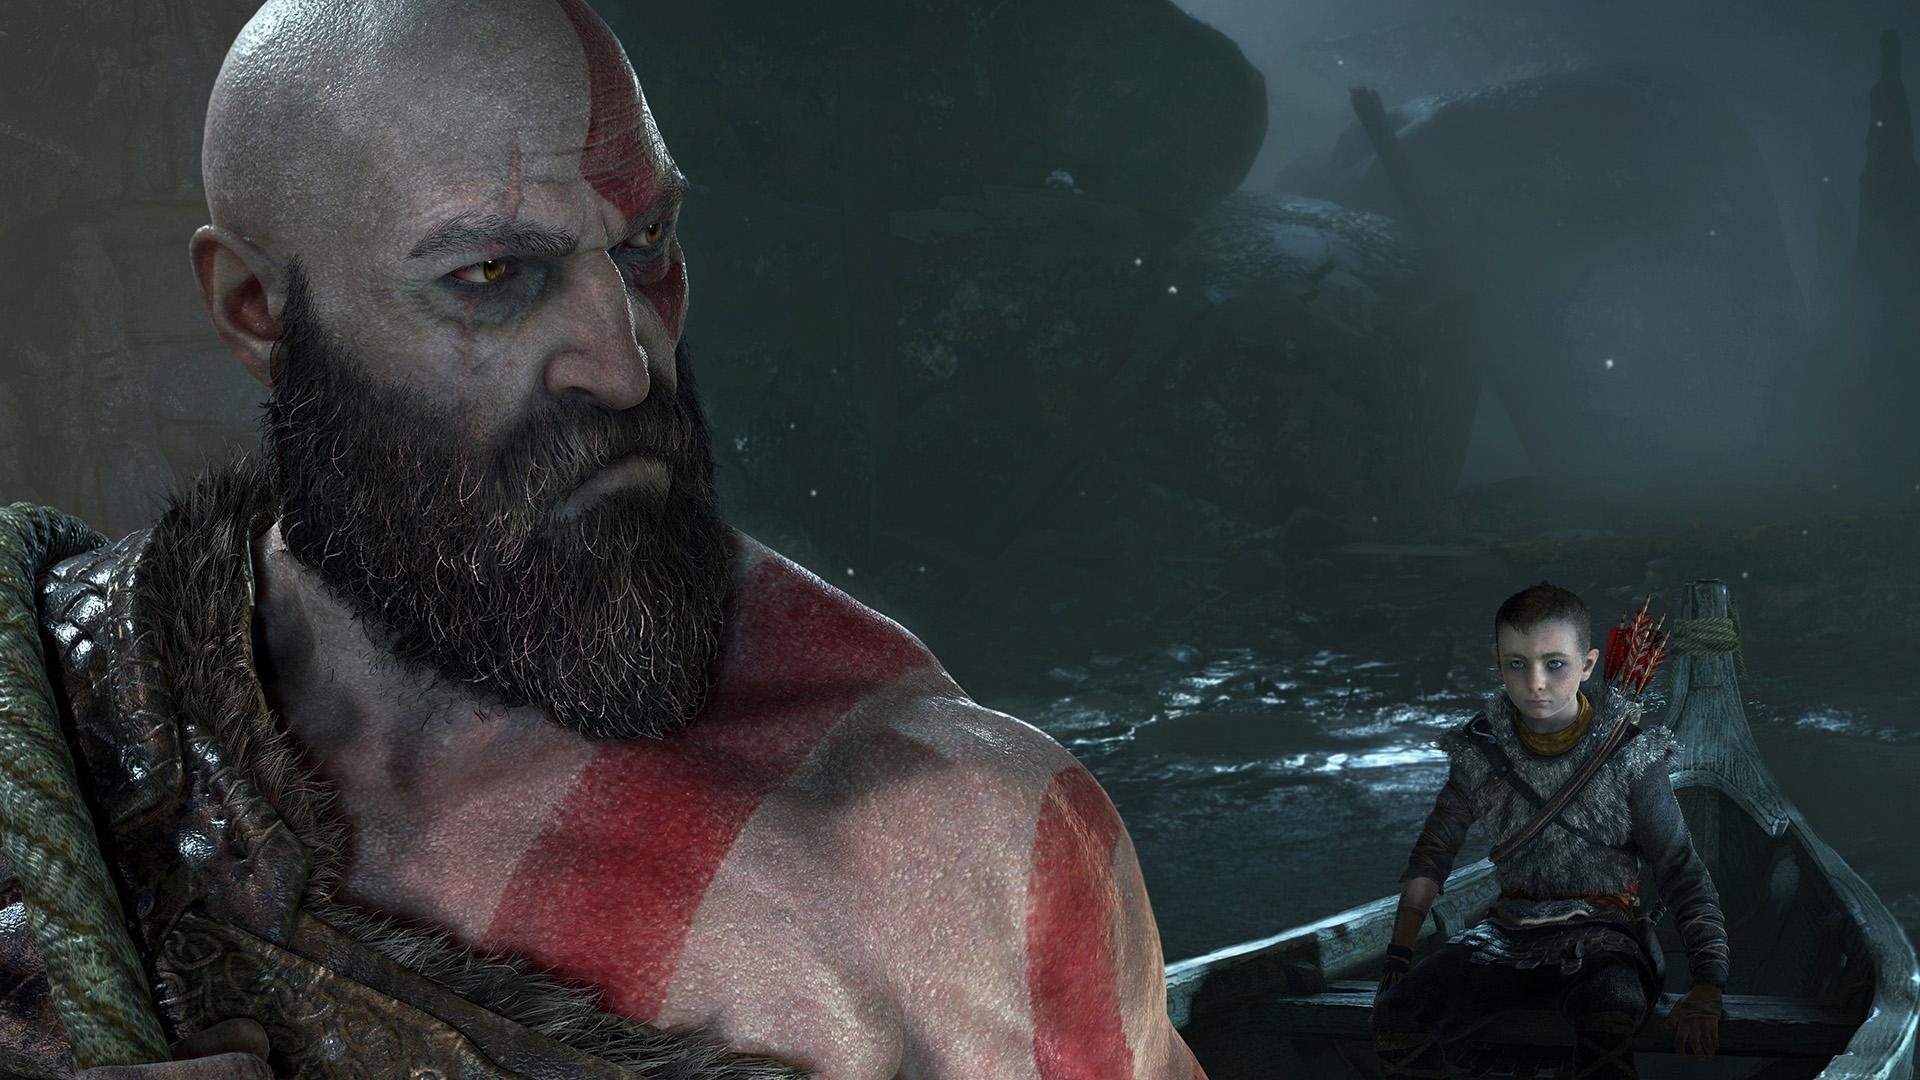 God of War: the quest to redeem Kratos